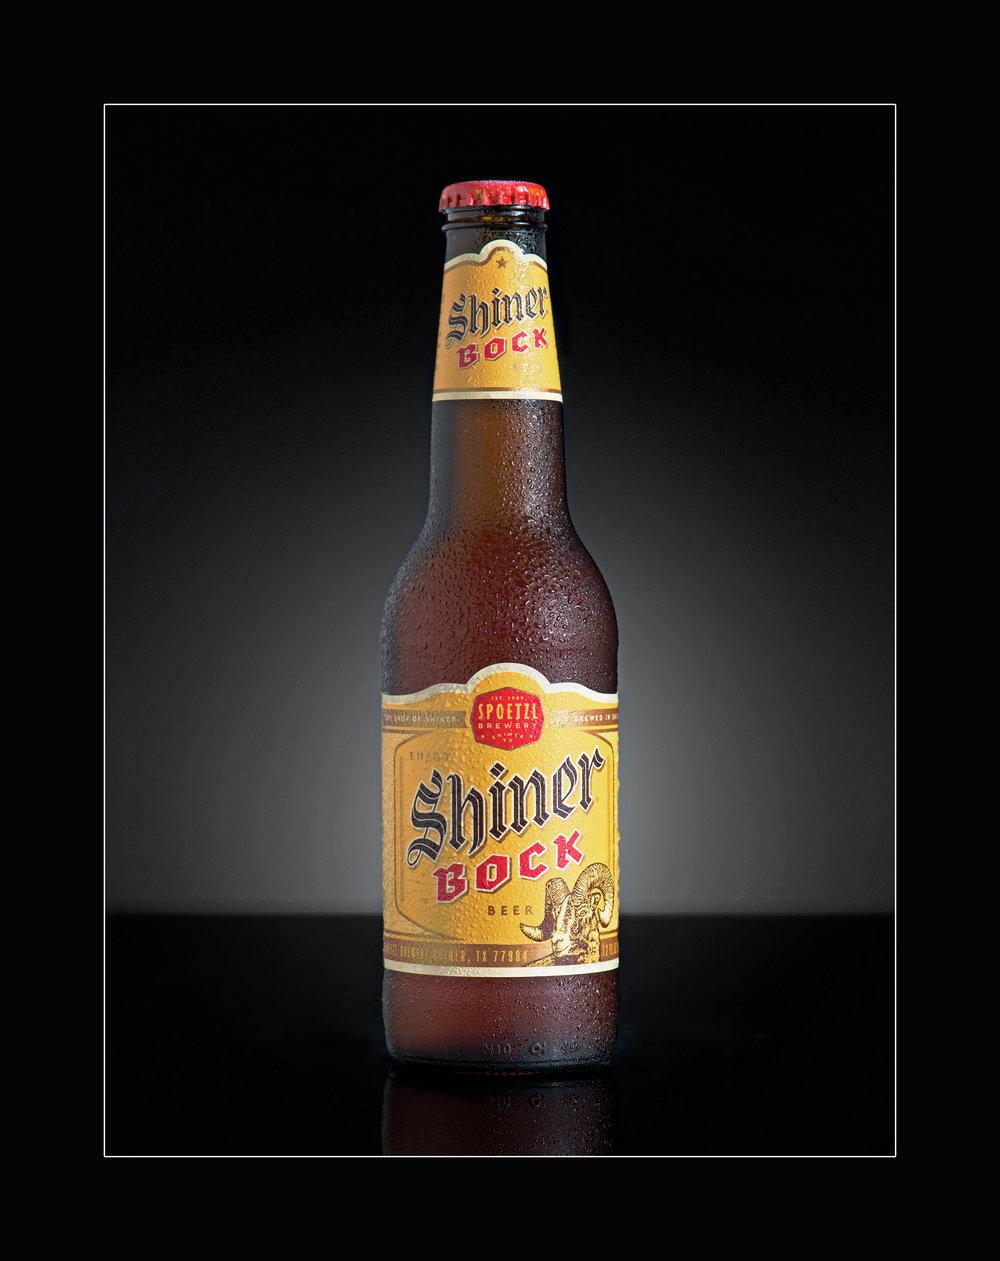 Shiner_SQUARE.jpg